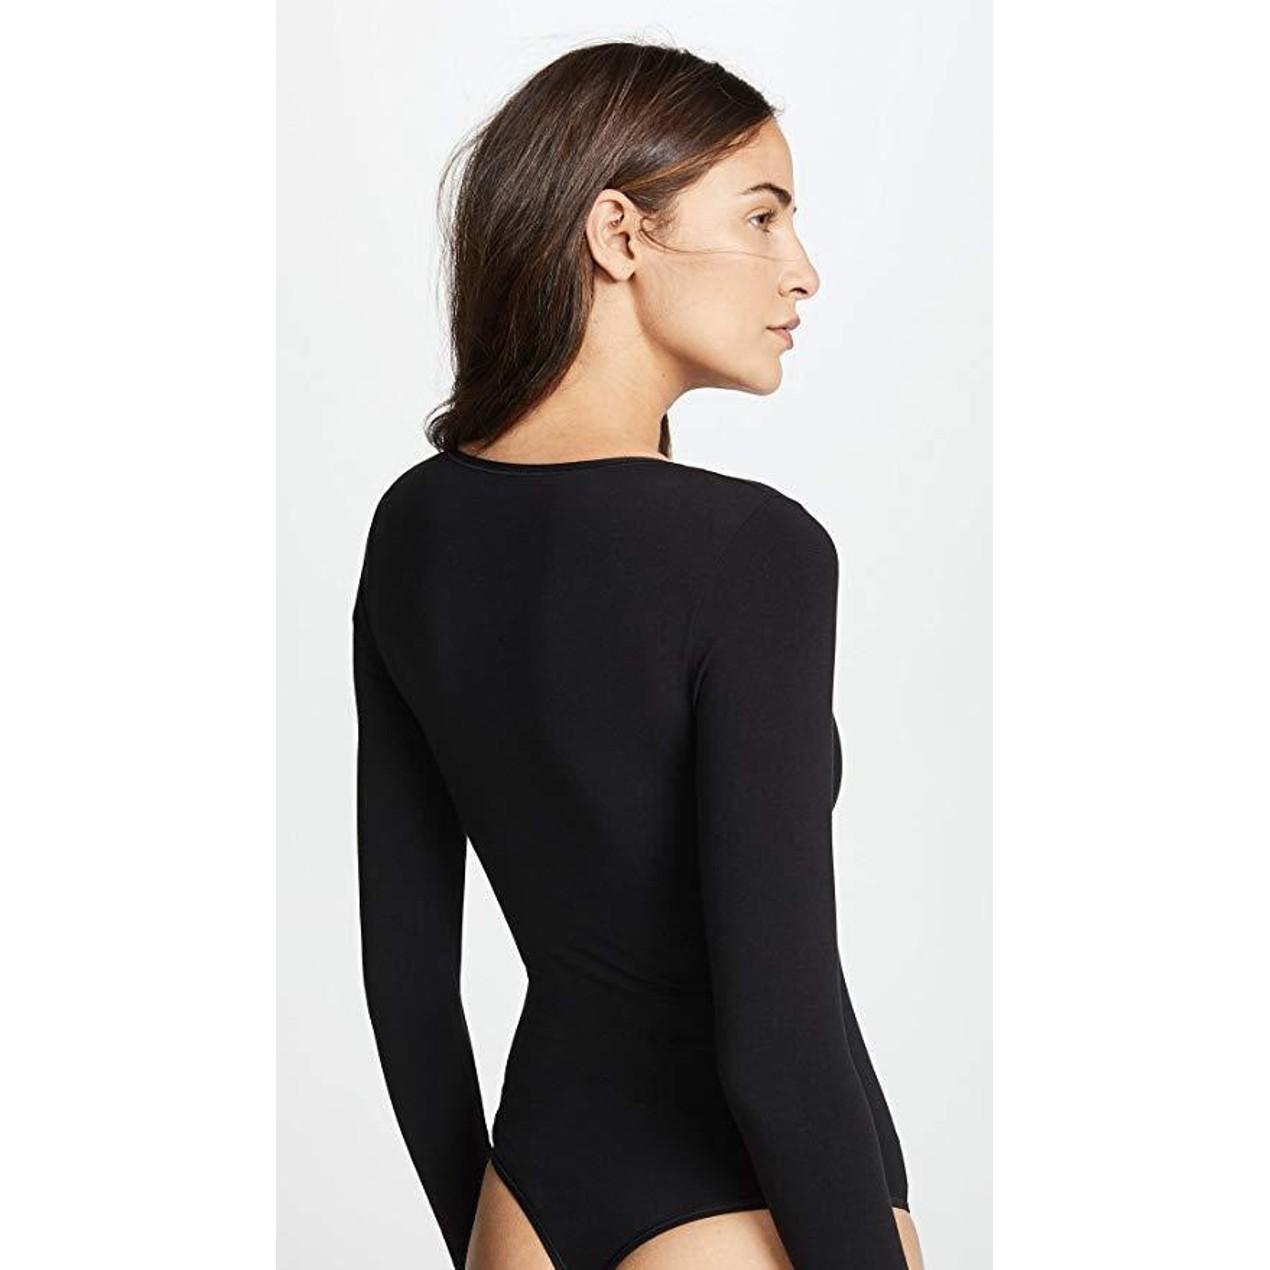 b016b39da334 ... Yummie Women's Long Sleeve Seamless Shaping Thong Bodysuit Black Sz La